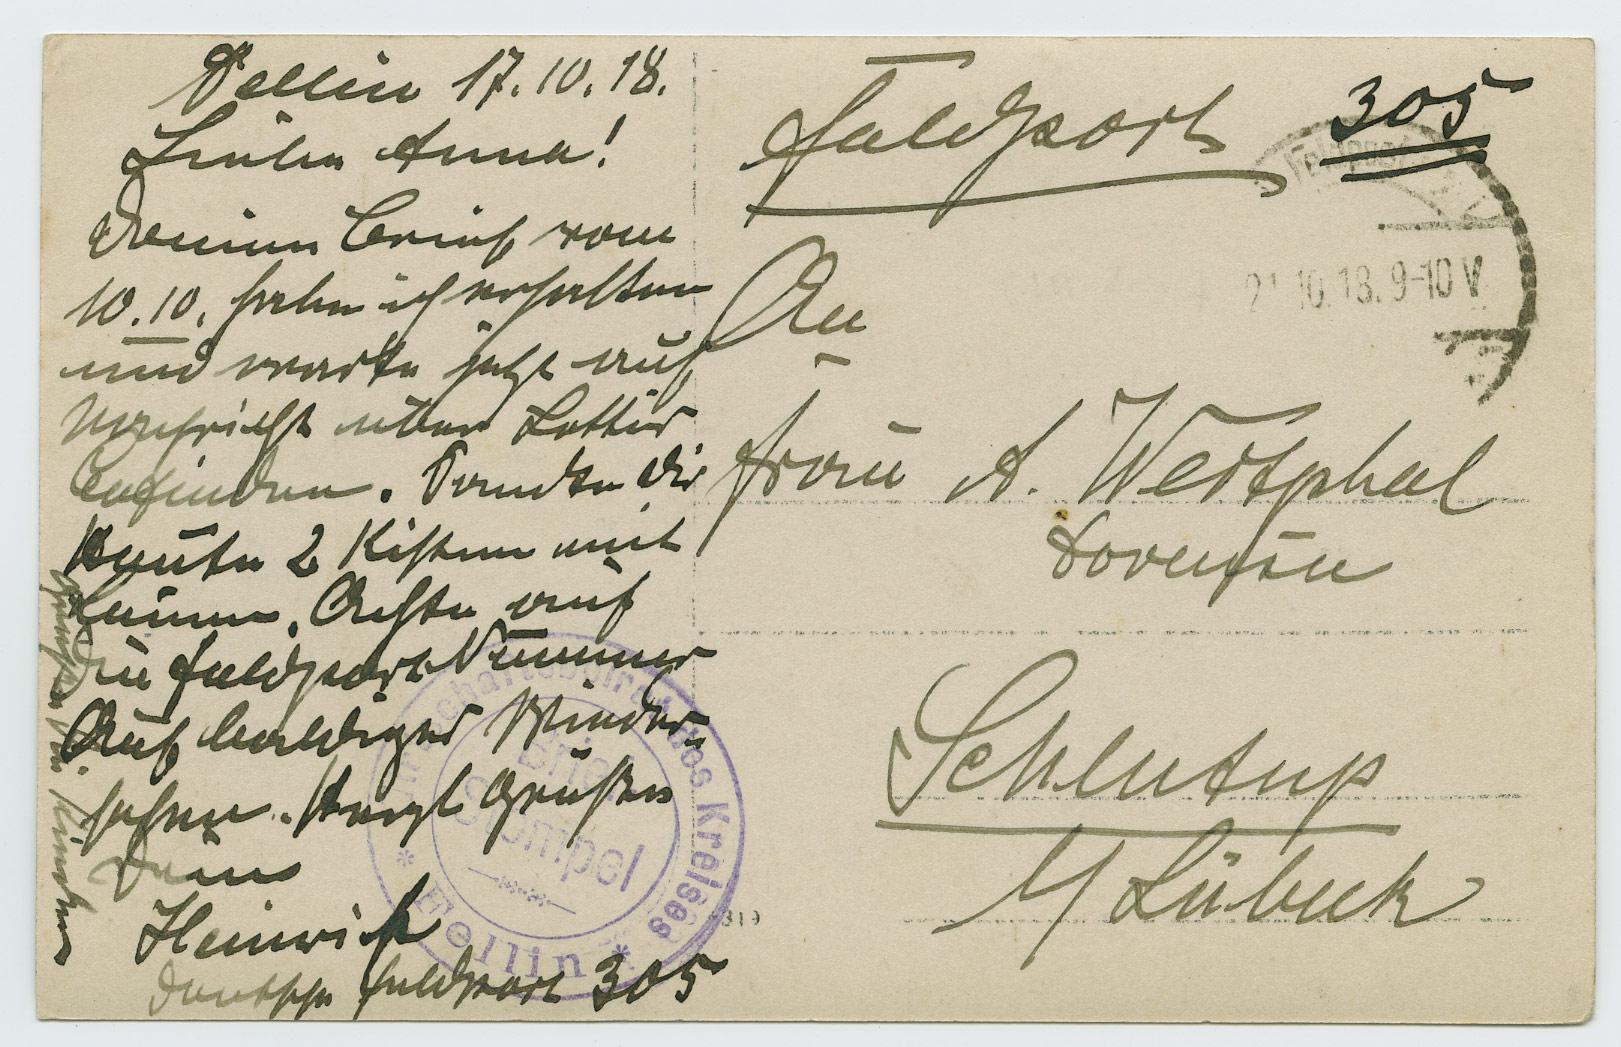 0616-Feldpost-305-Estland-Fellin Briefstempel-1918-postiajalugu-ee